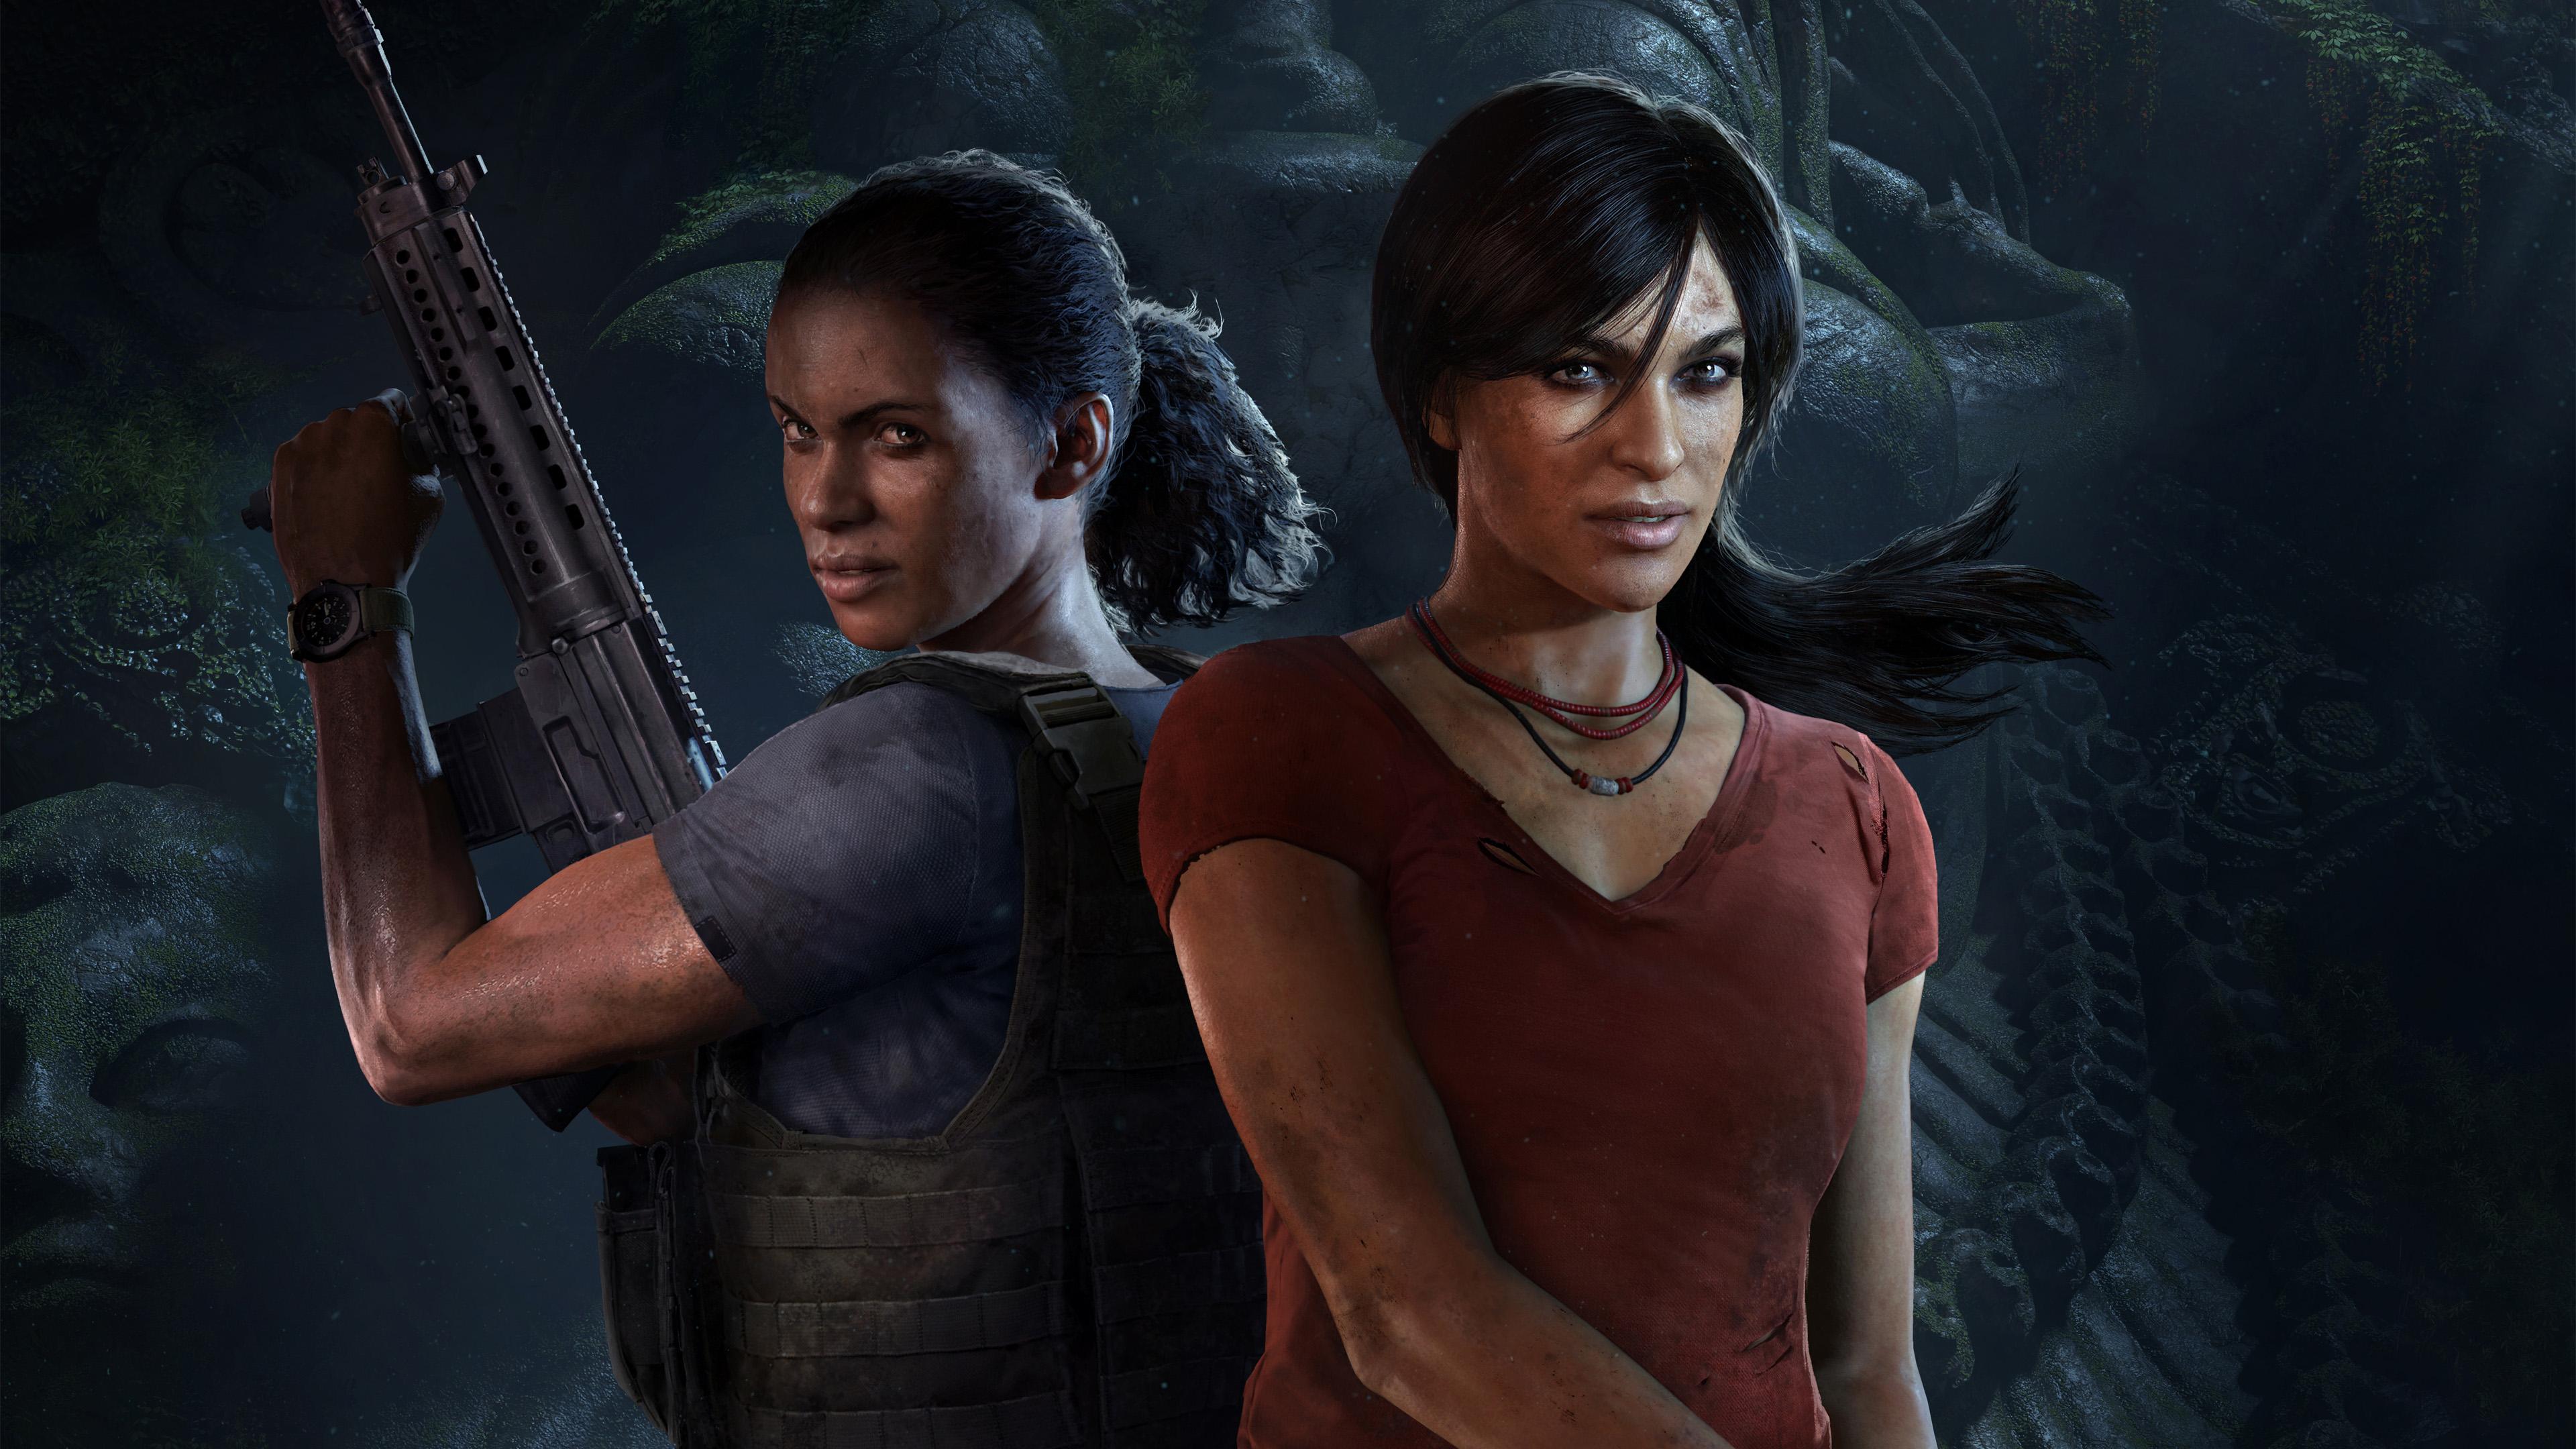 Хлоя и Надин - Uncharted: The Lost Legacy 4K, Арт